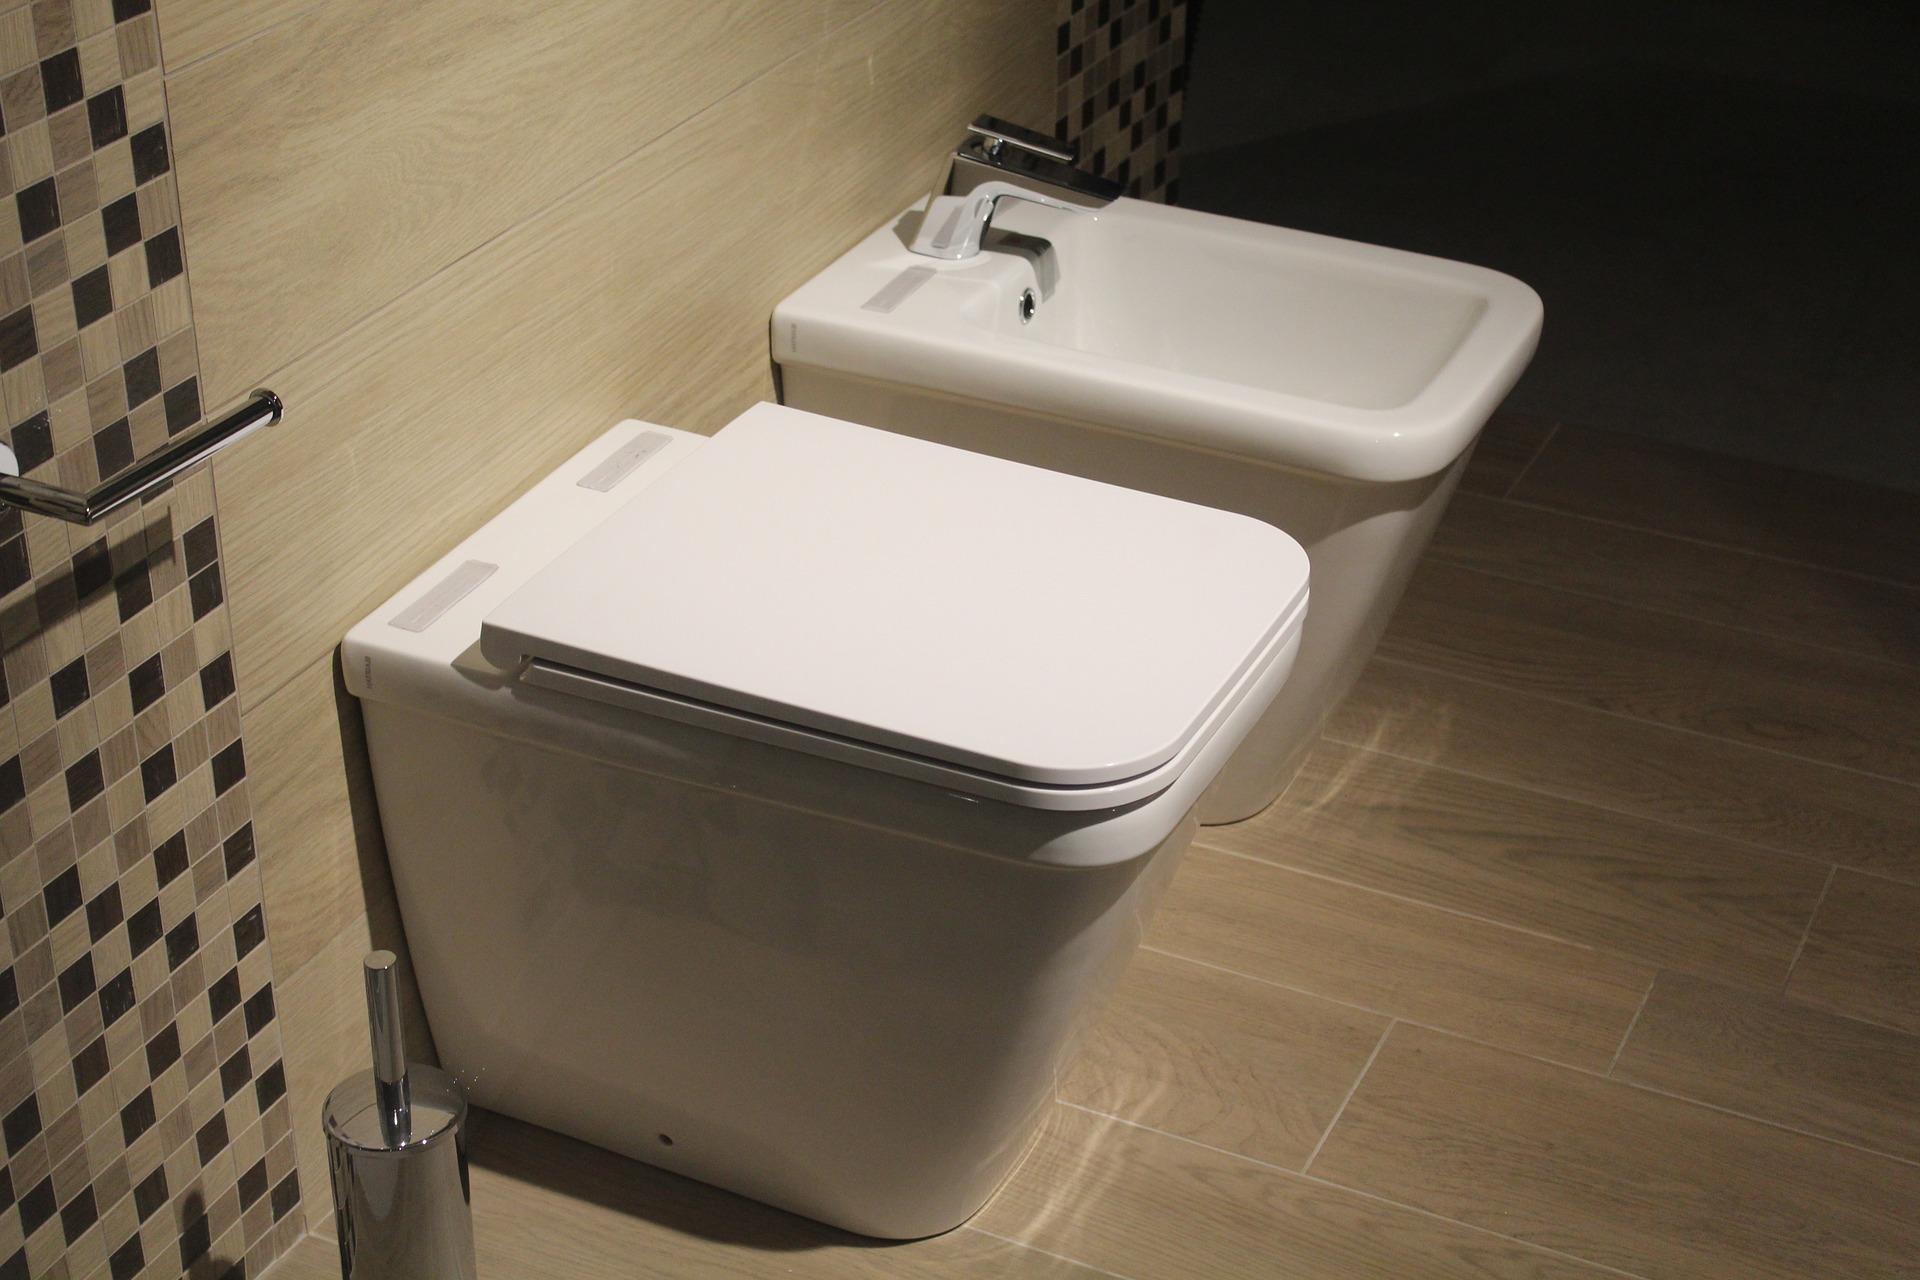 sanitaire sanibroyeur